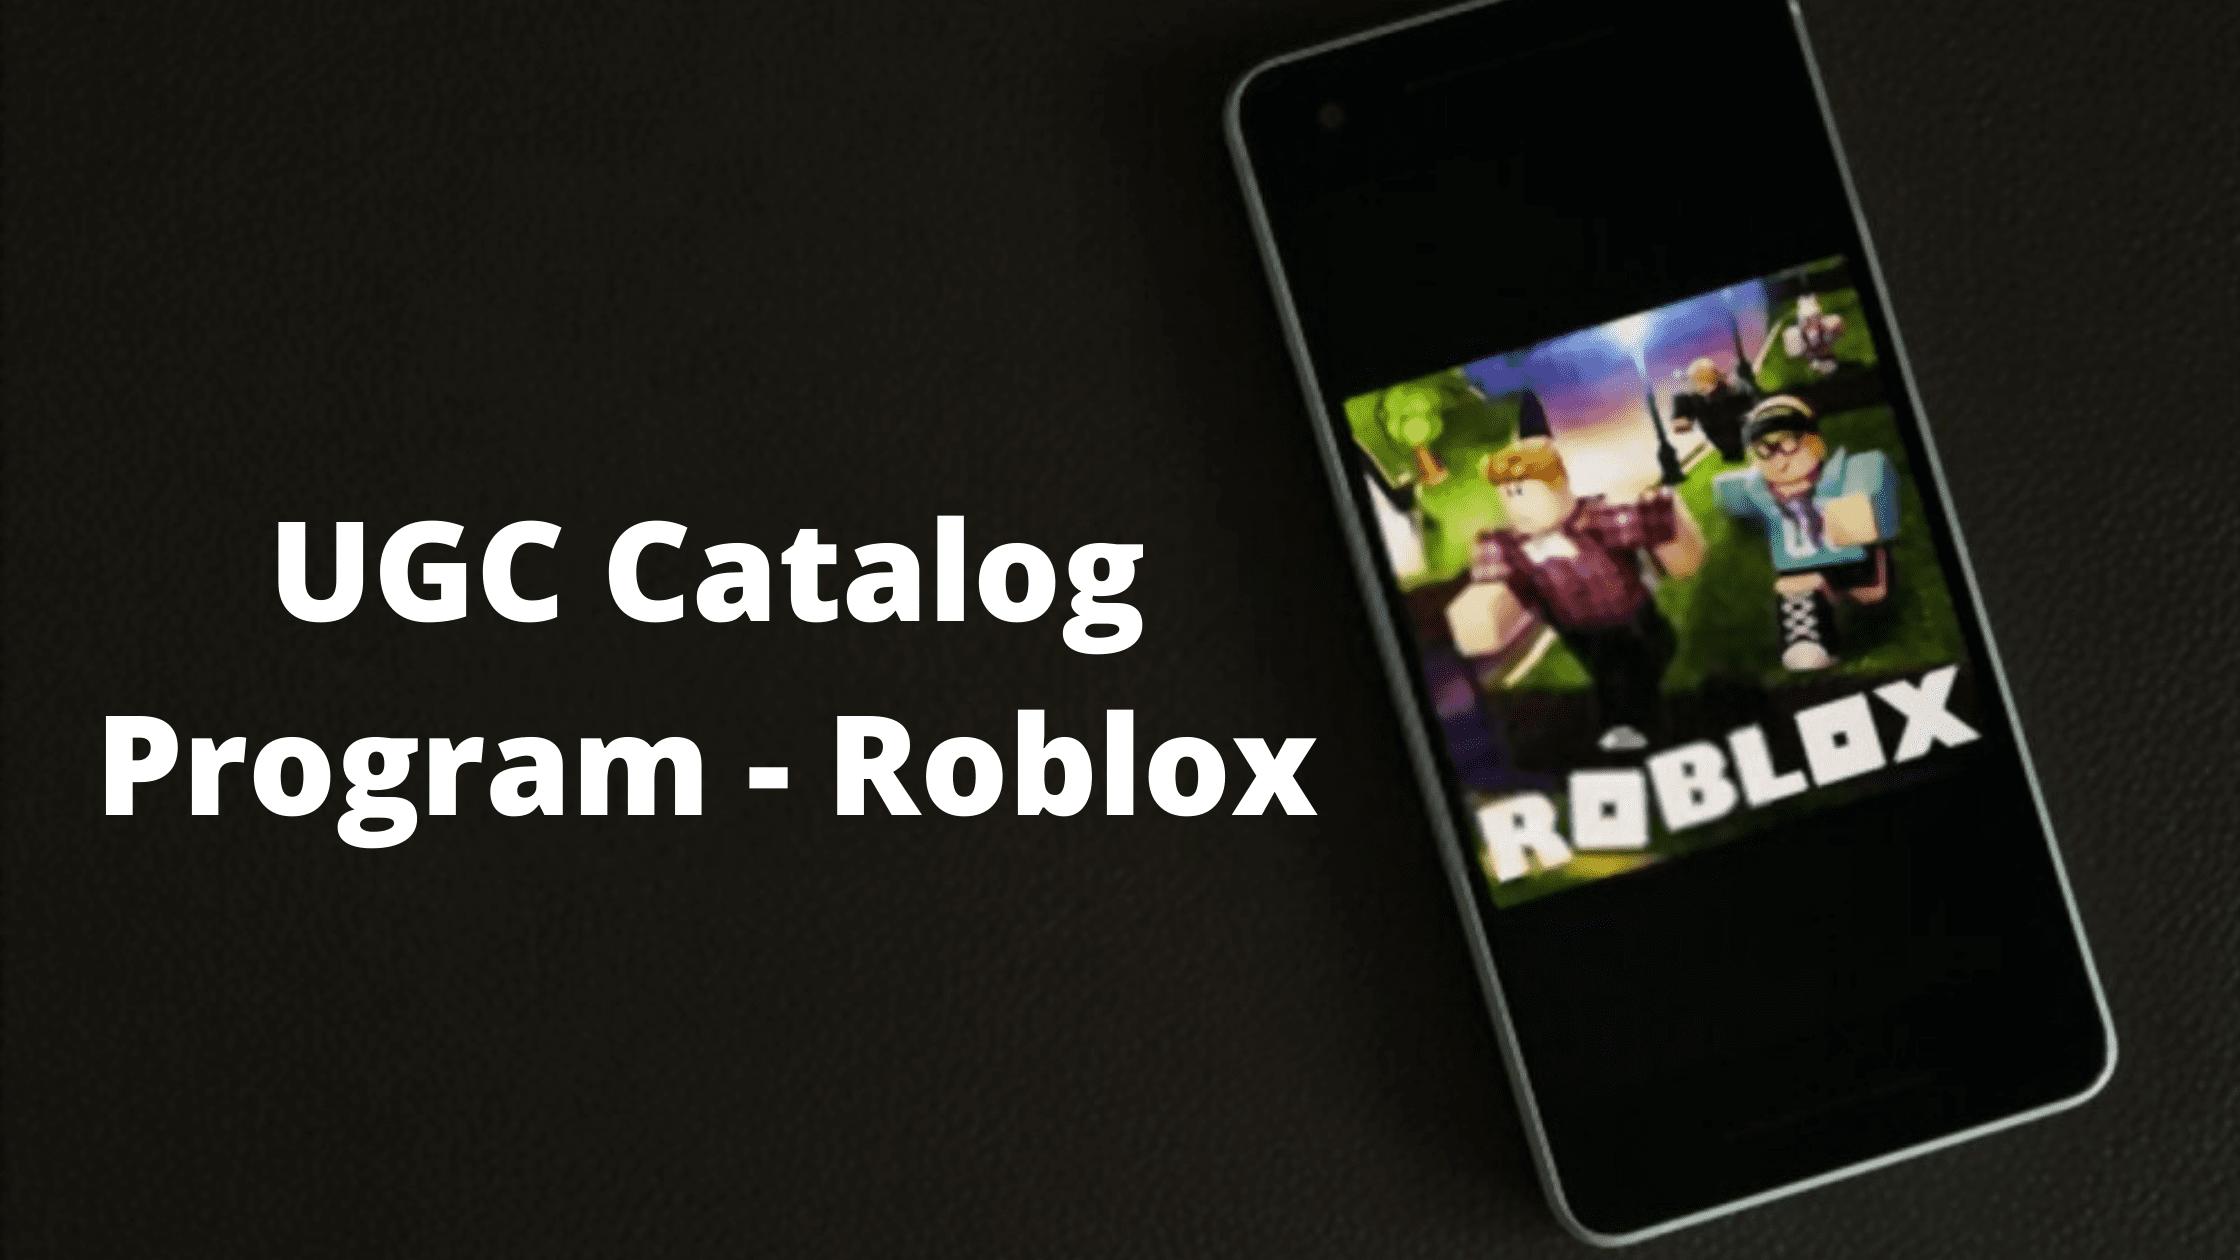 UGC Catalog Roblox